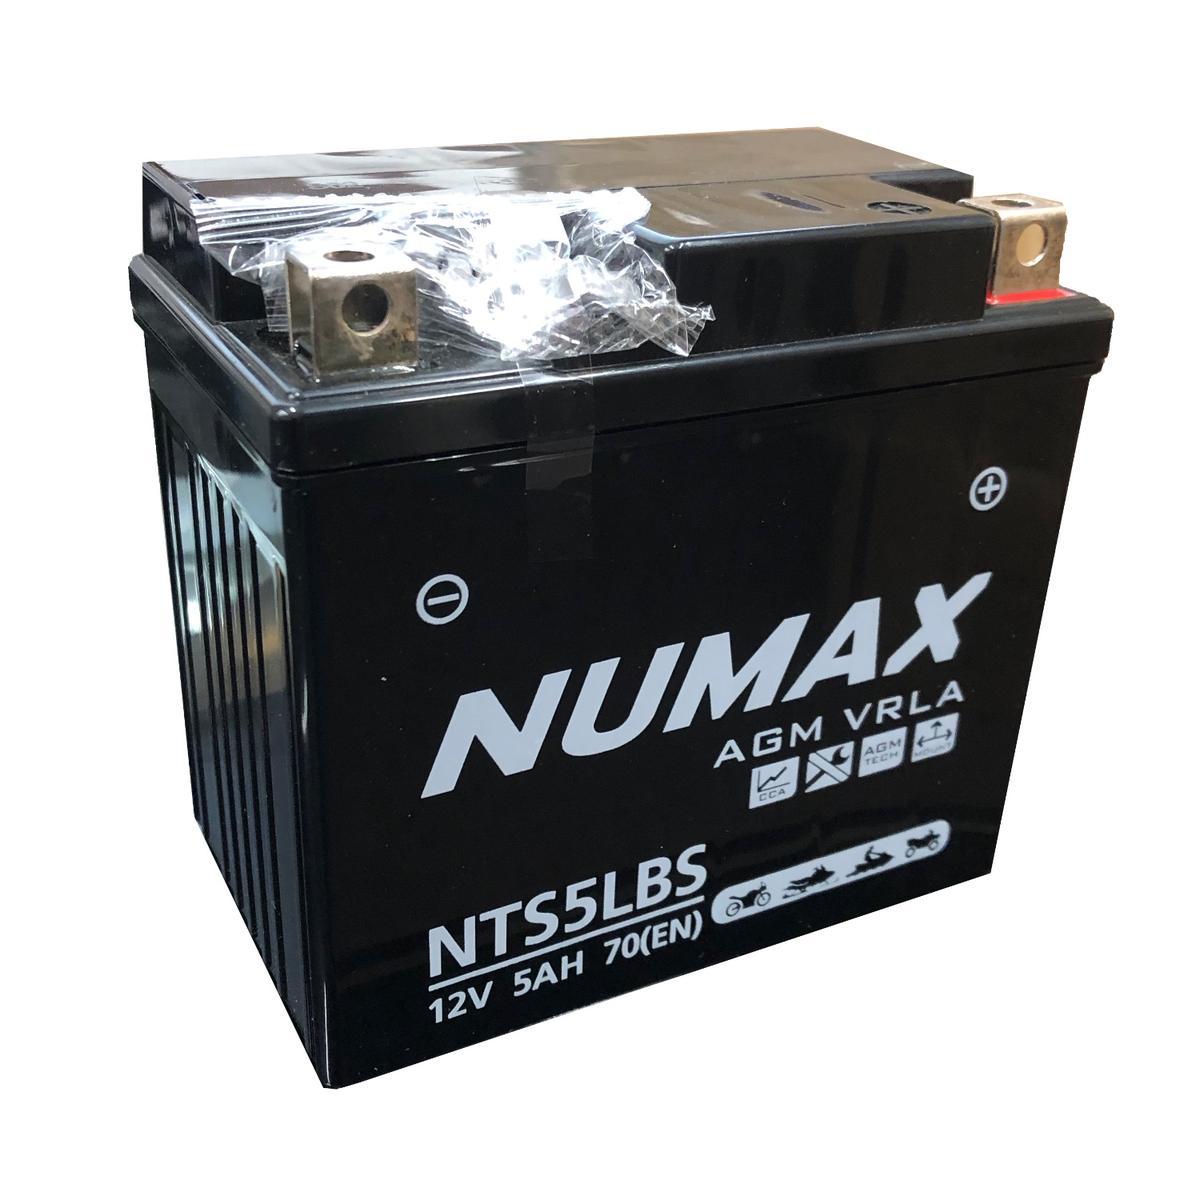 Numax 12v NTS5LBS Motorbike Bike Battery HONDA 100cc NF100 YTX5L-BS